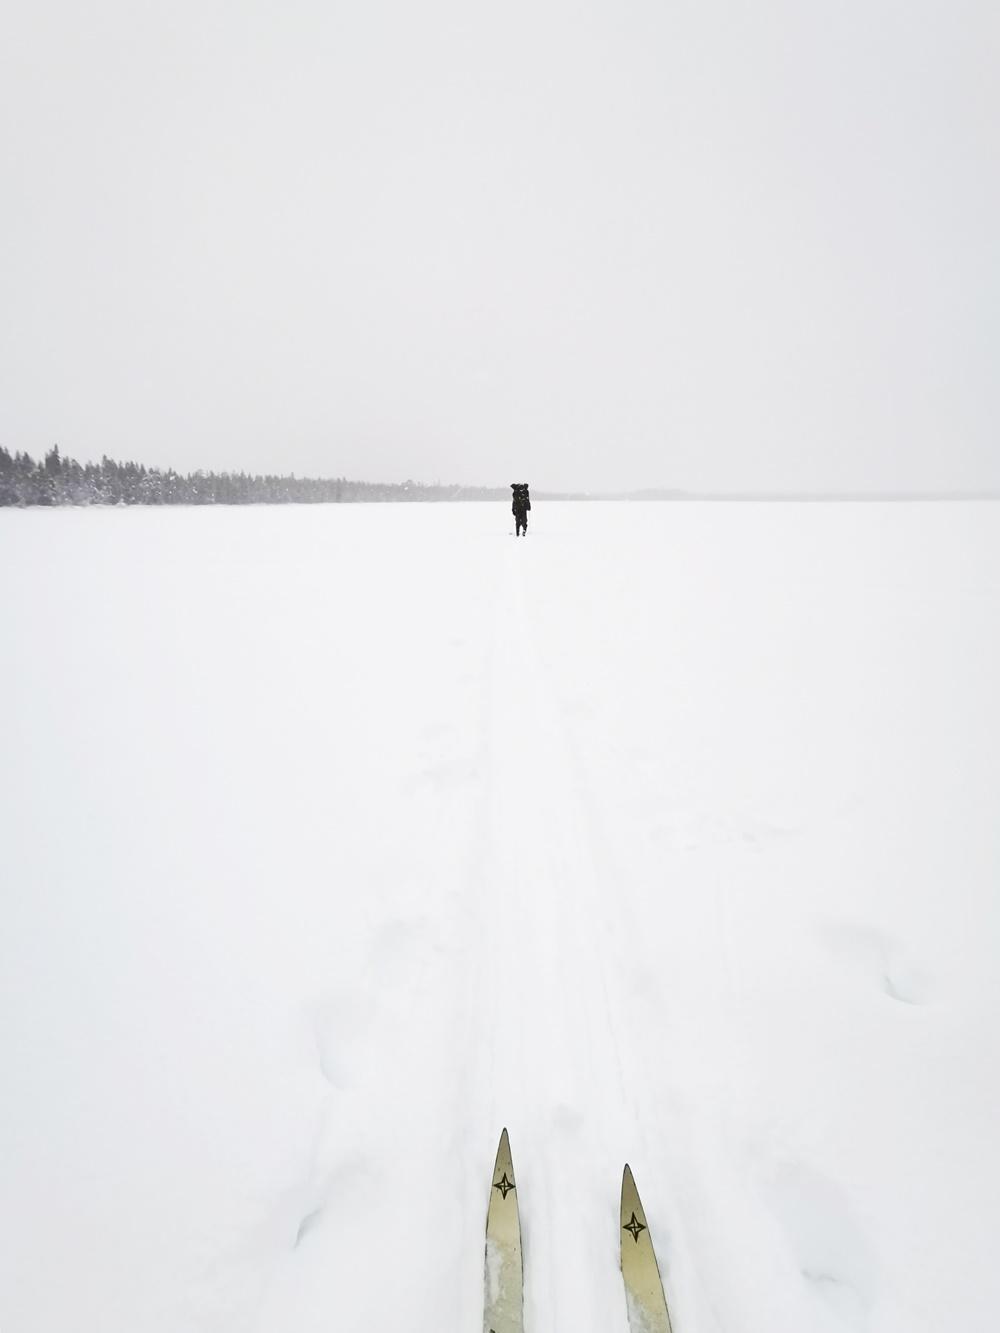 Skiing in snowstorm in Lapland